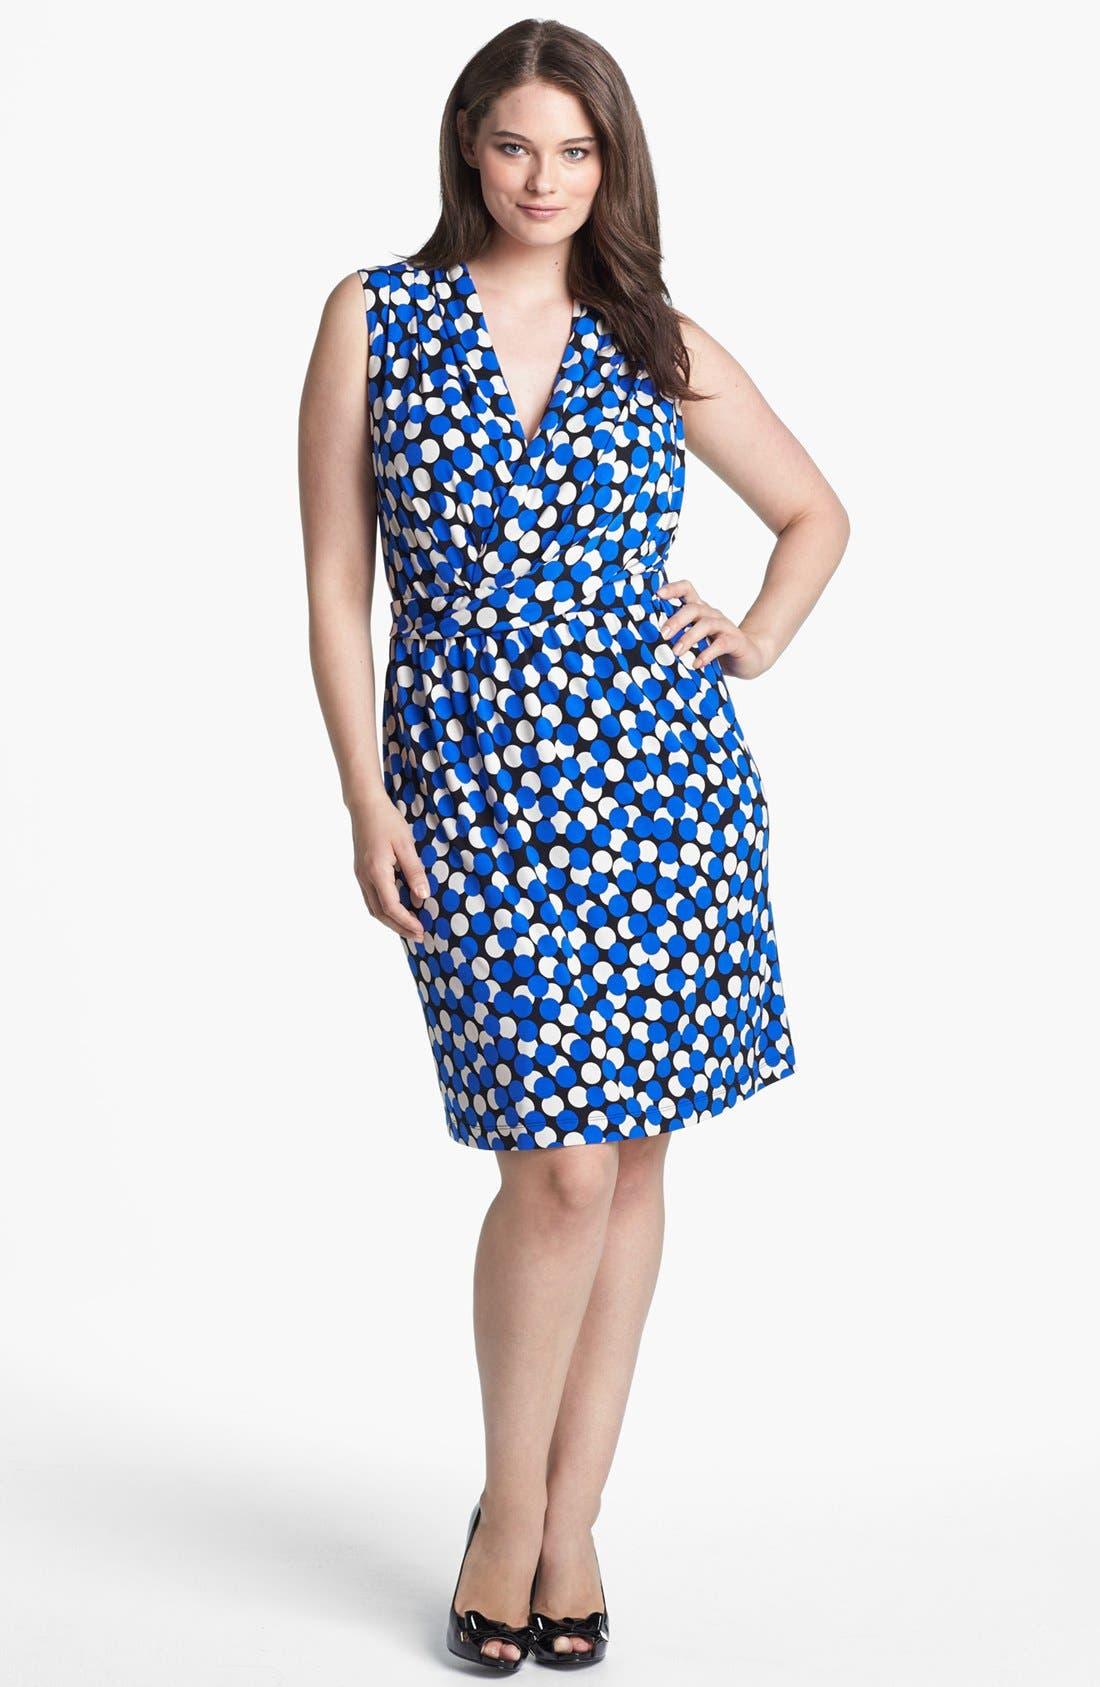 Alternate Image 1 Selected - Donna Ricco Dot Print Sheath Dress (Plus Size)